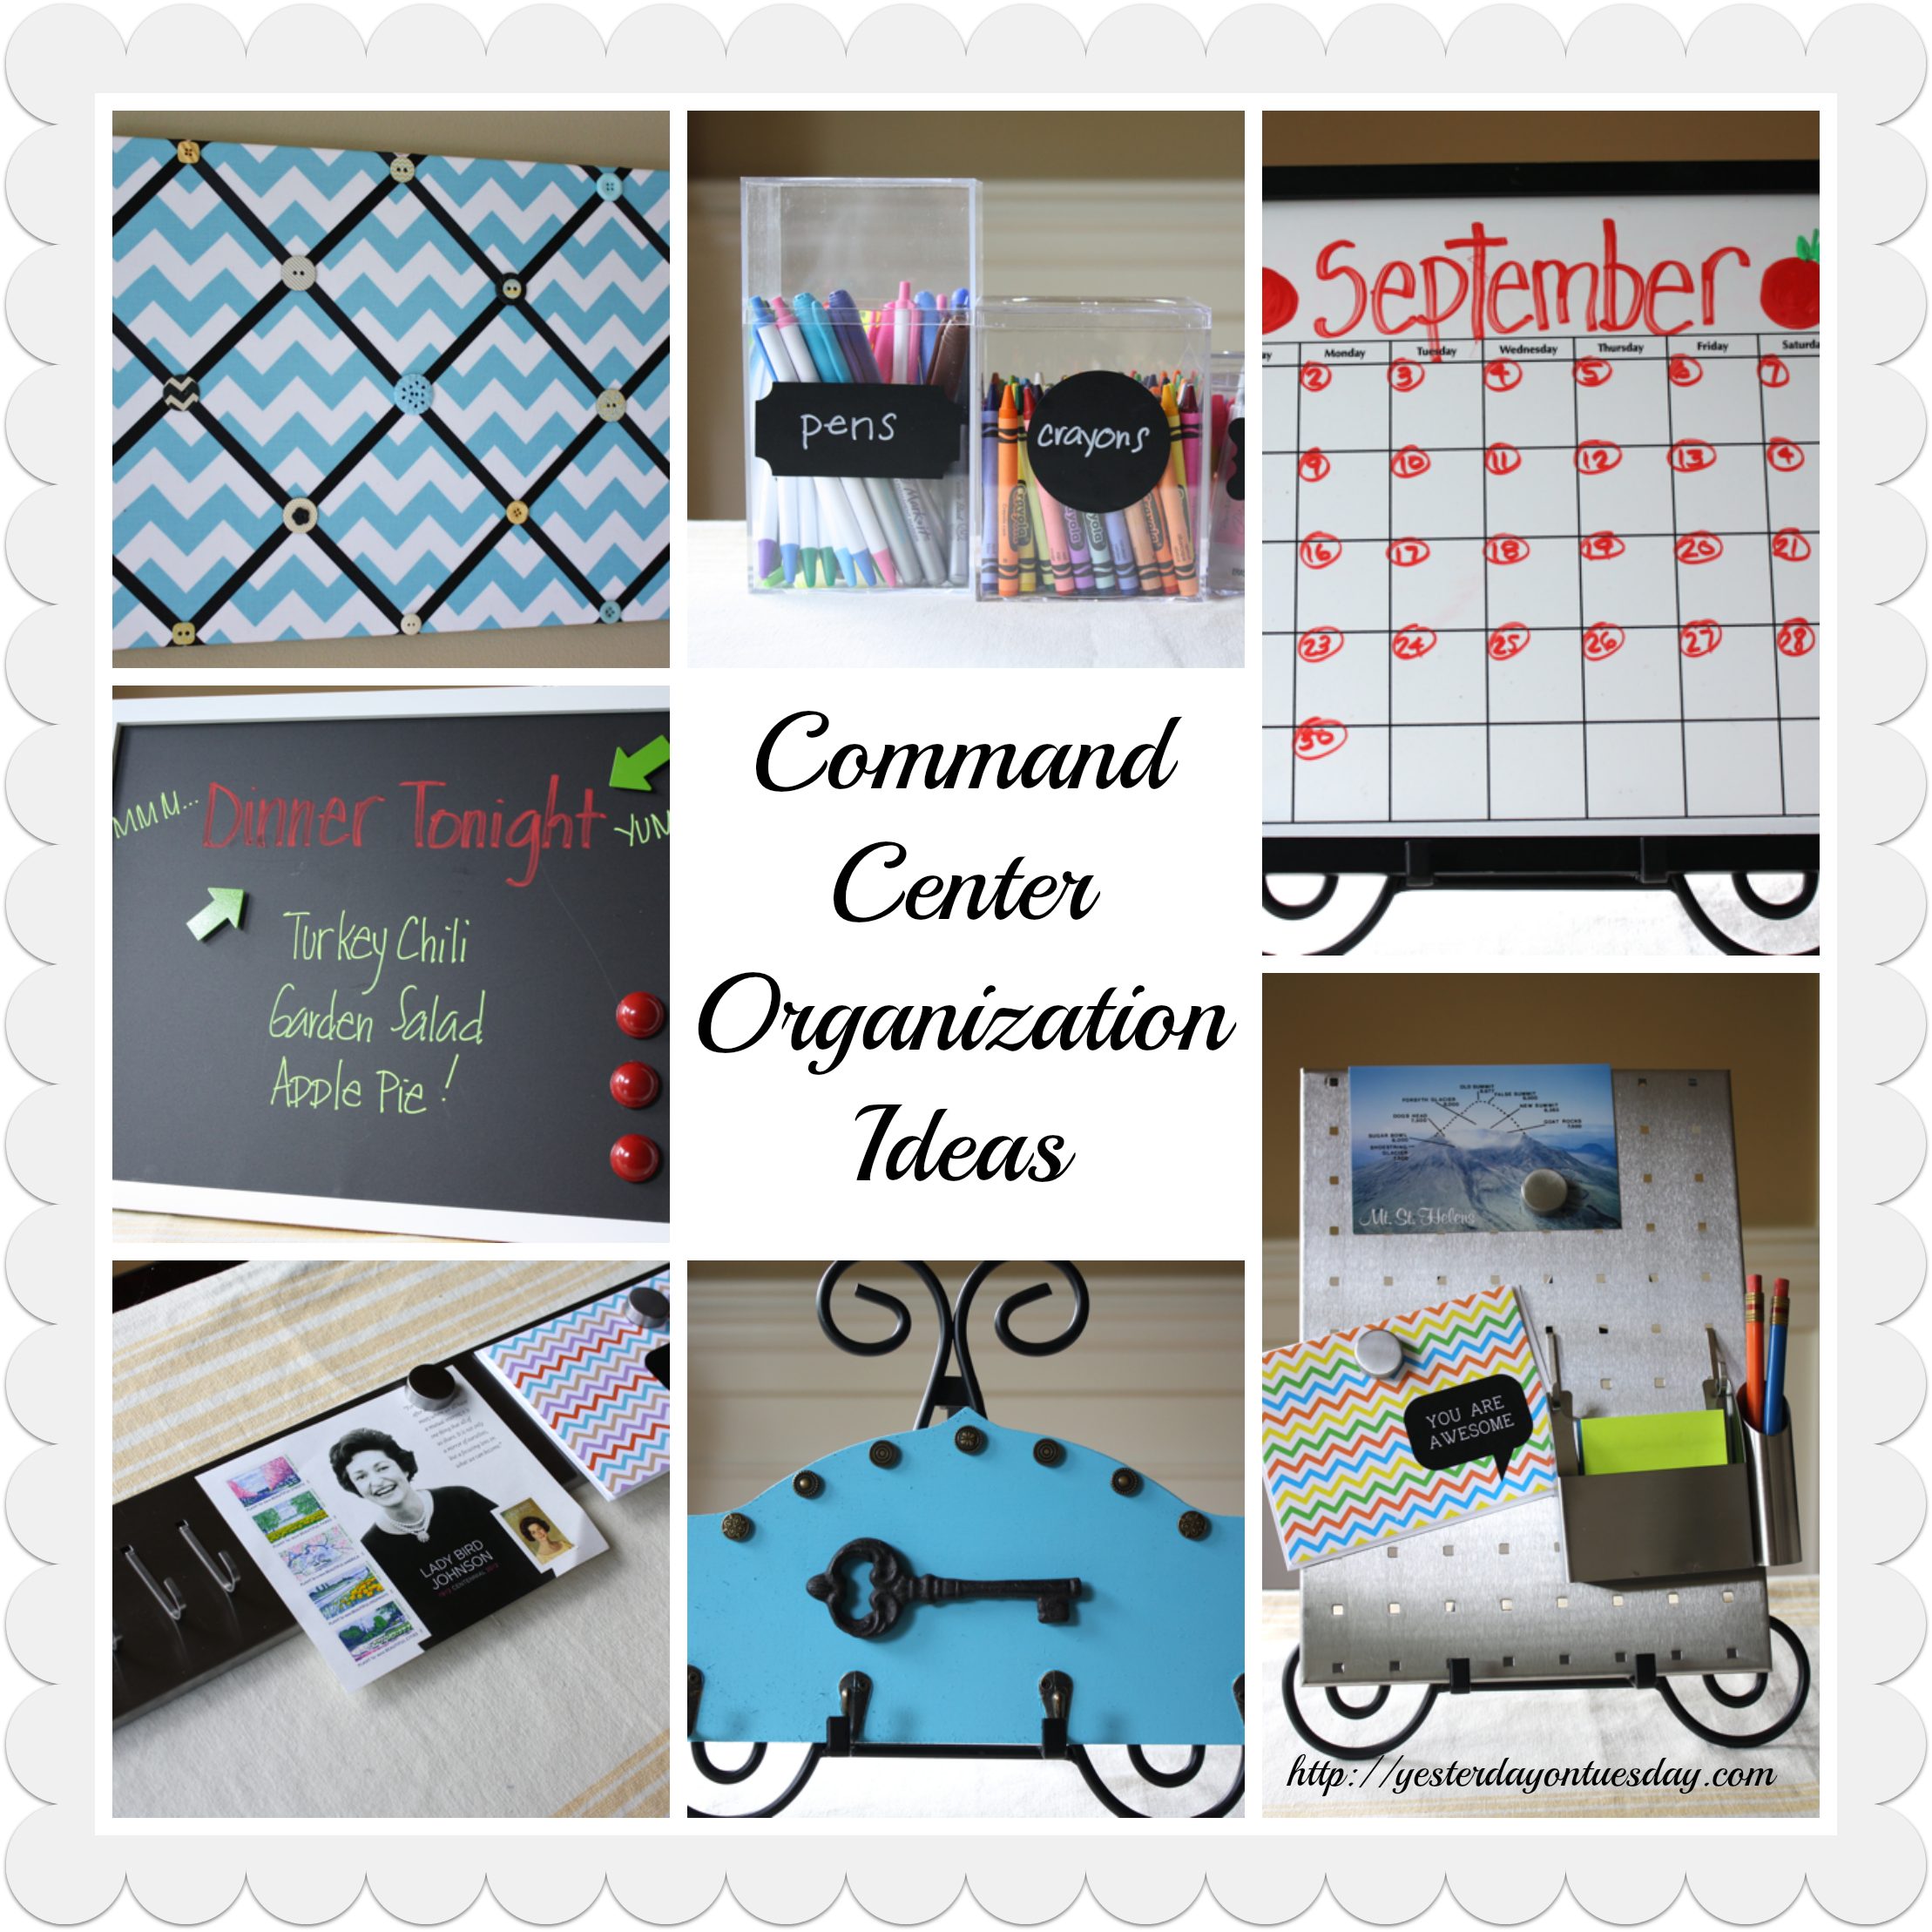 Command Center Organization Ideas